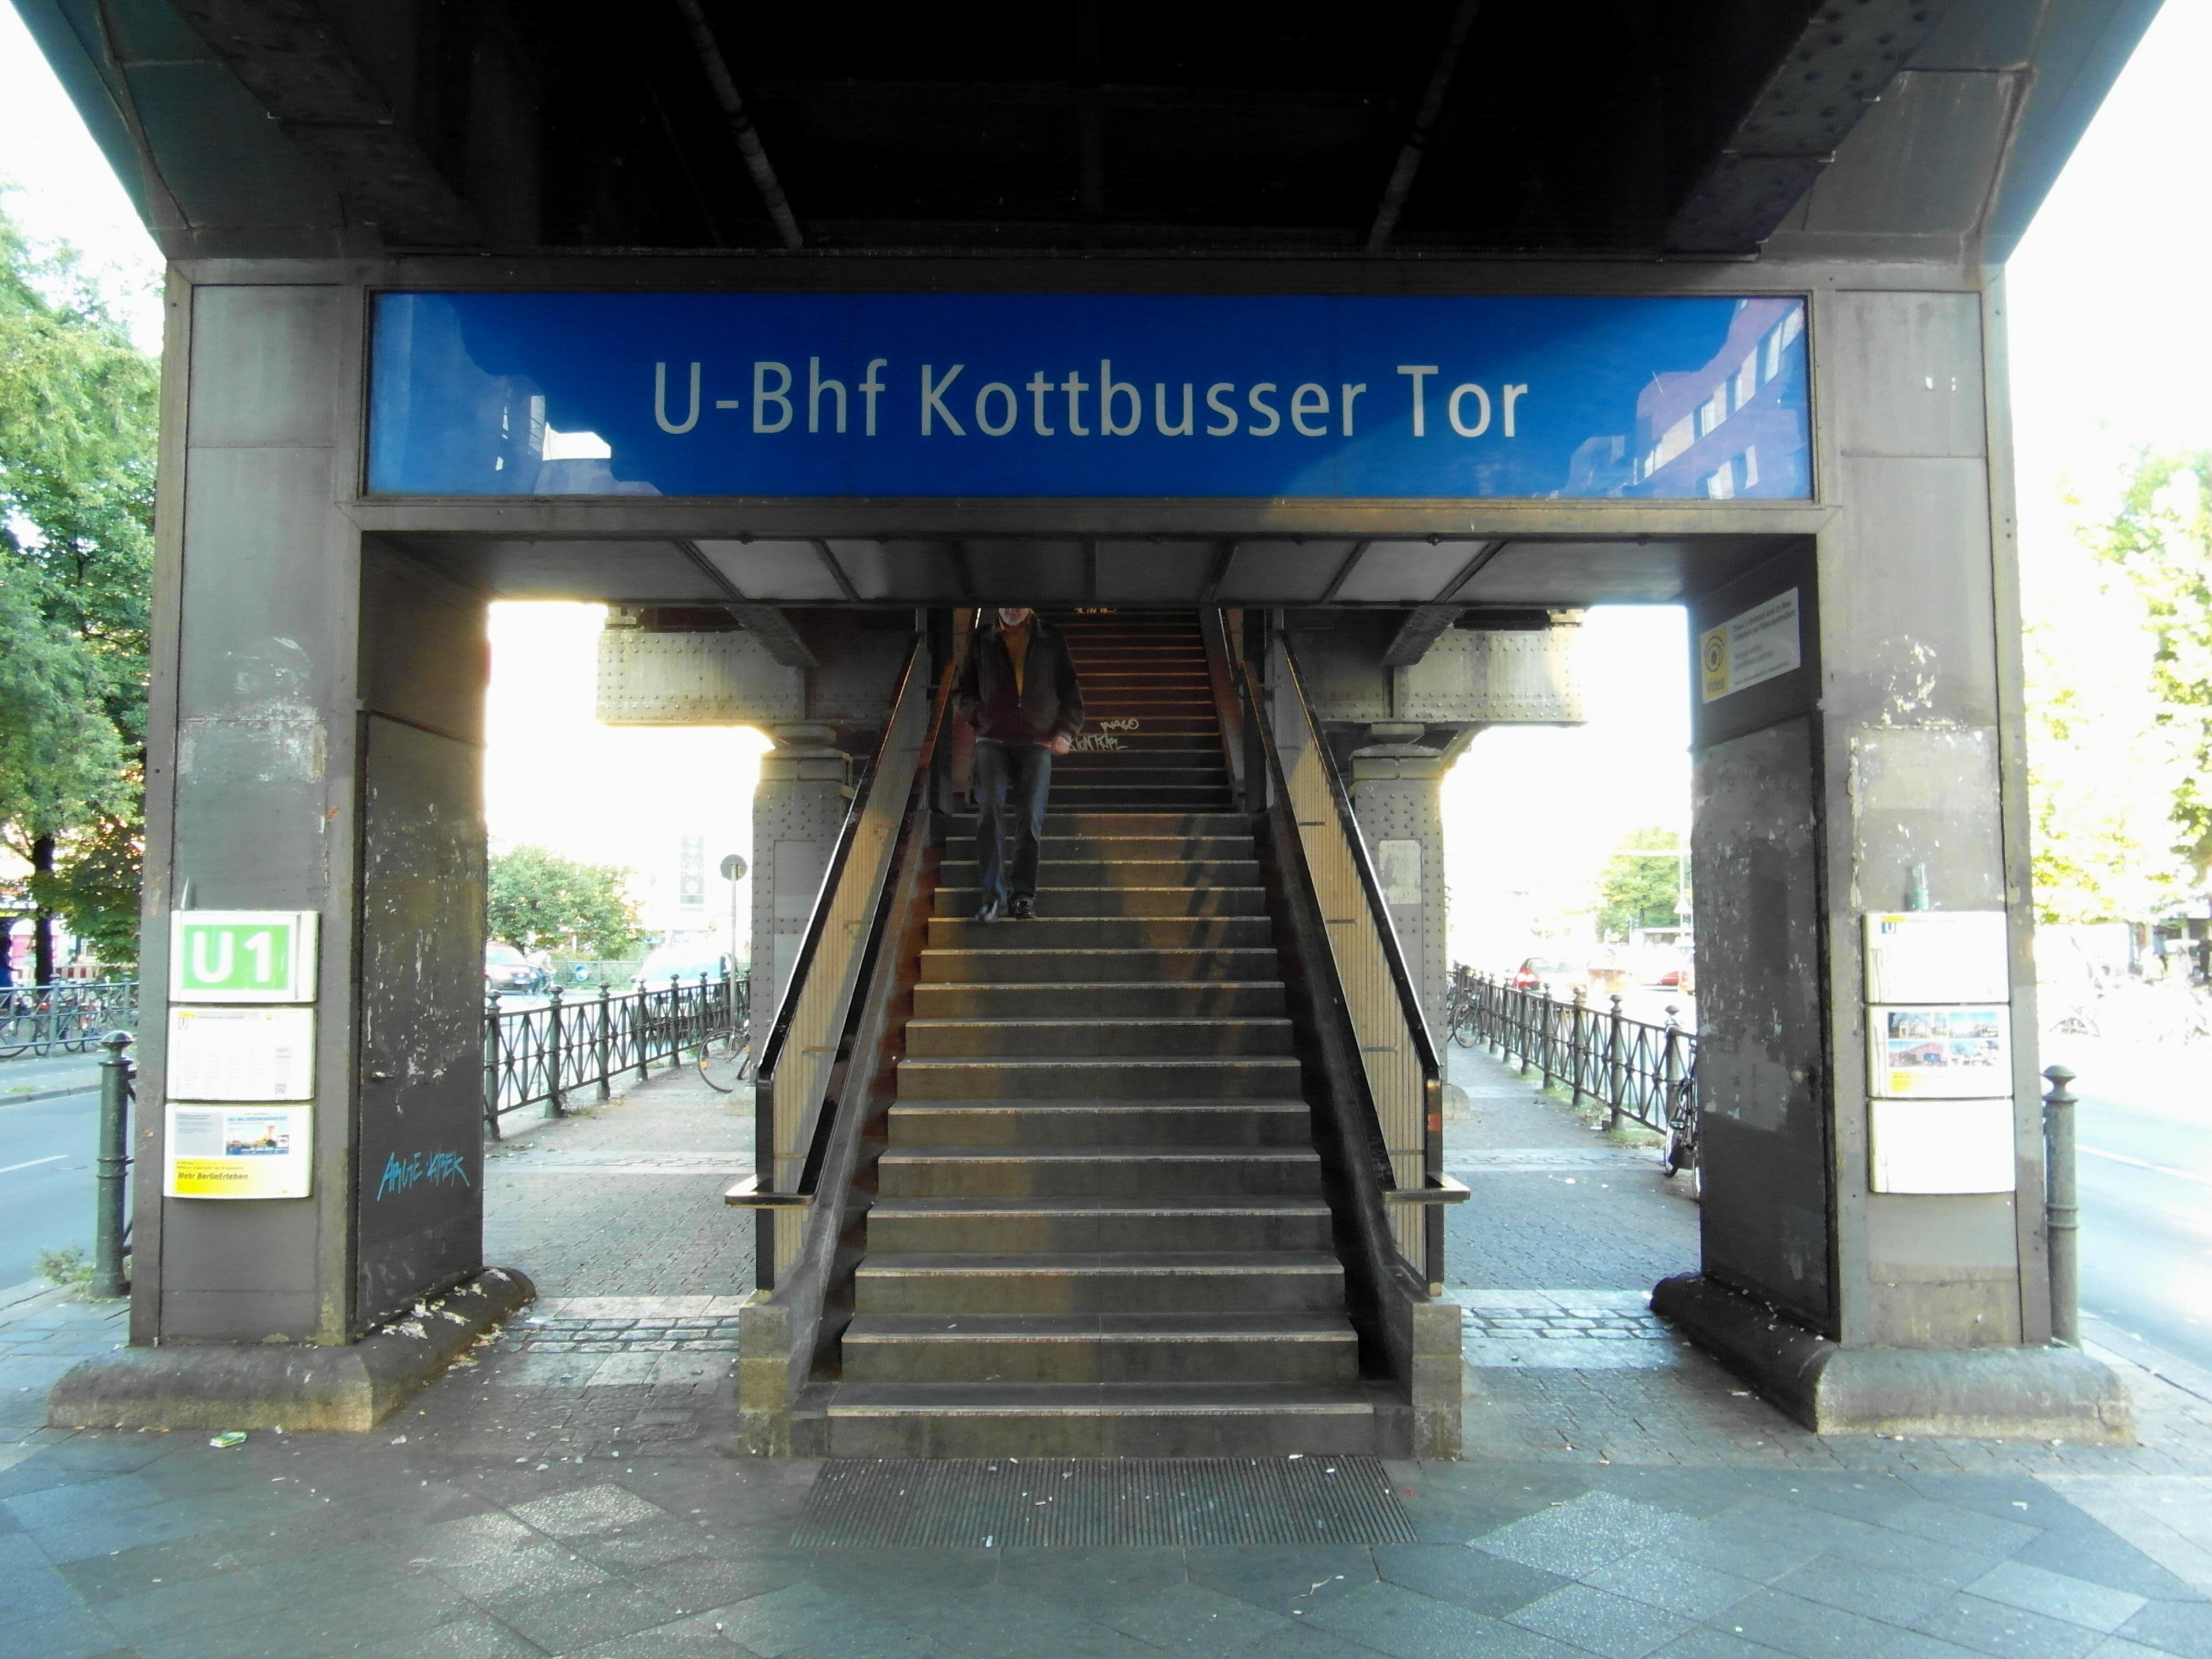 Flickr - IngolfBLN - Berlin - U-Bahnhof Kottbusser Tor (53).jpg